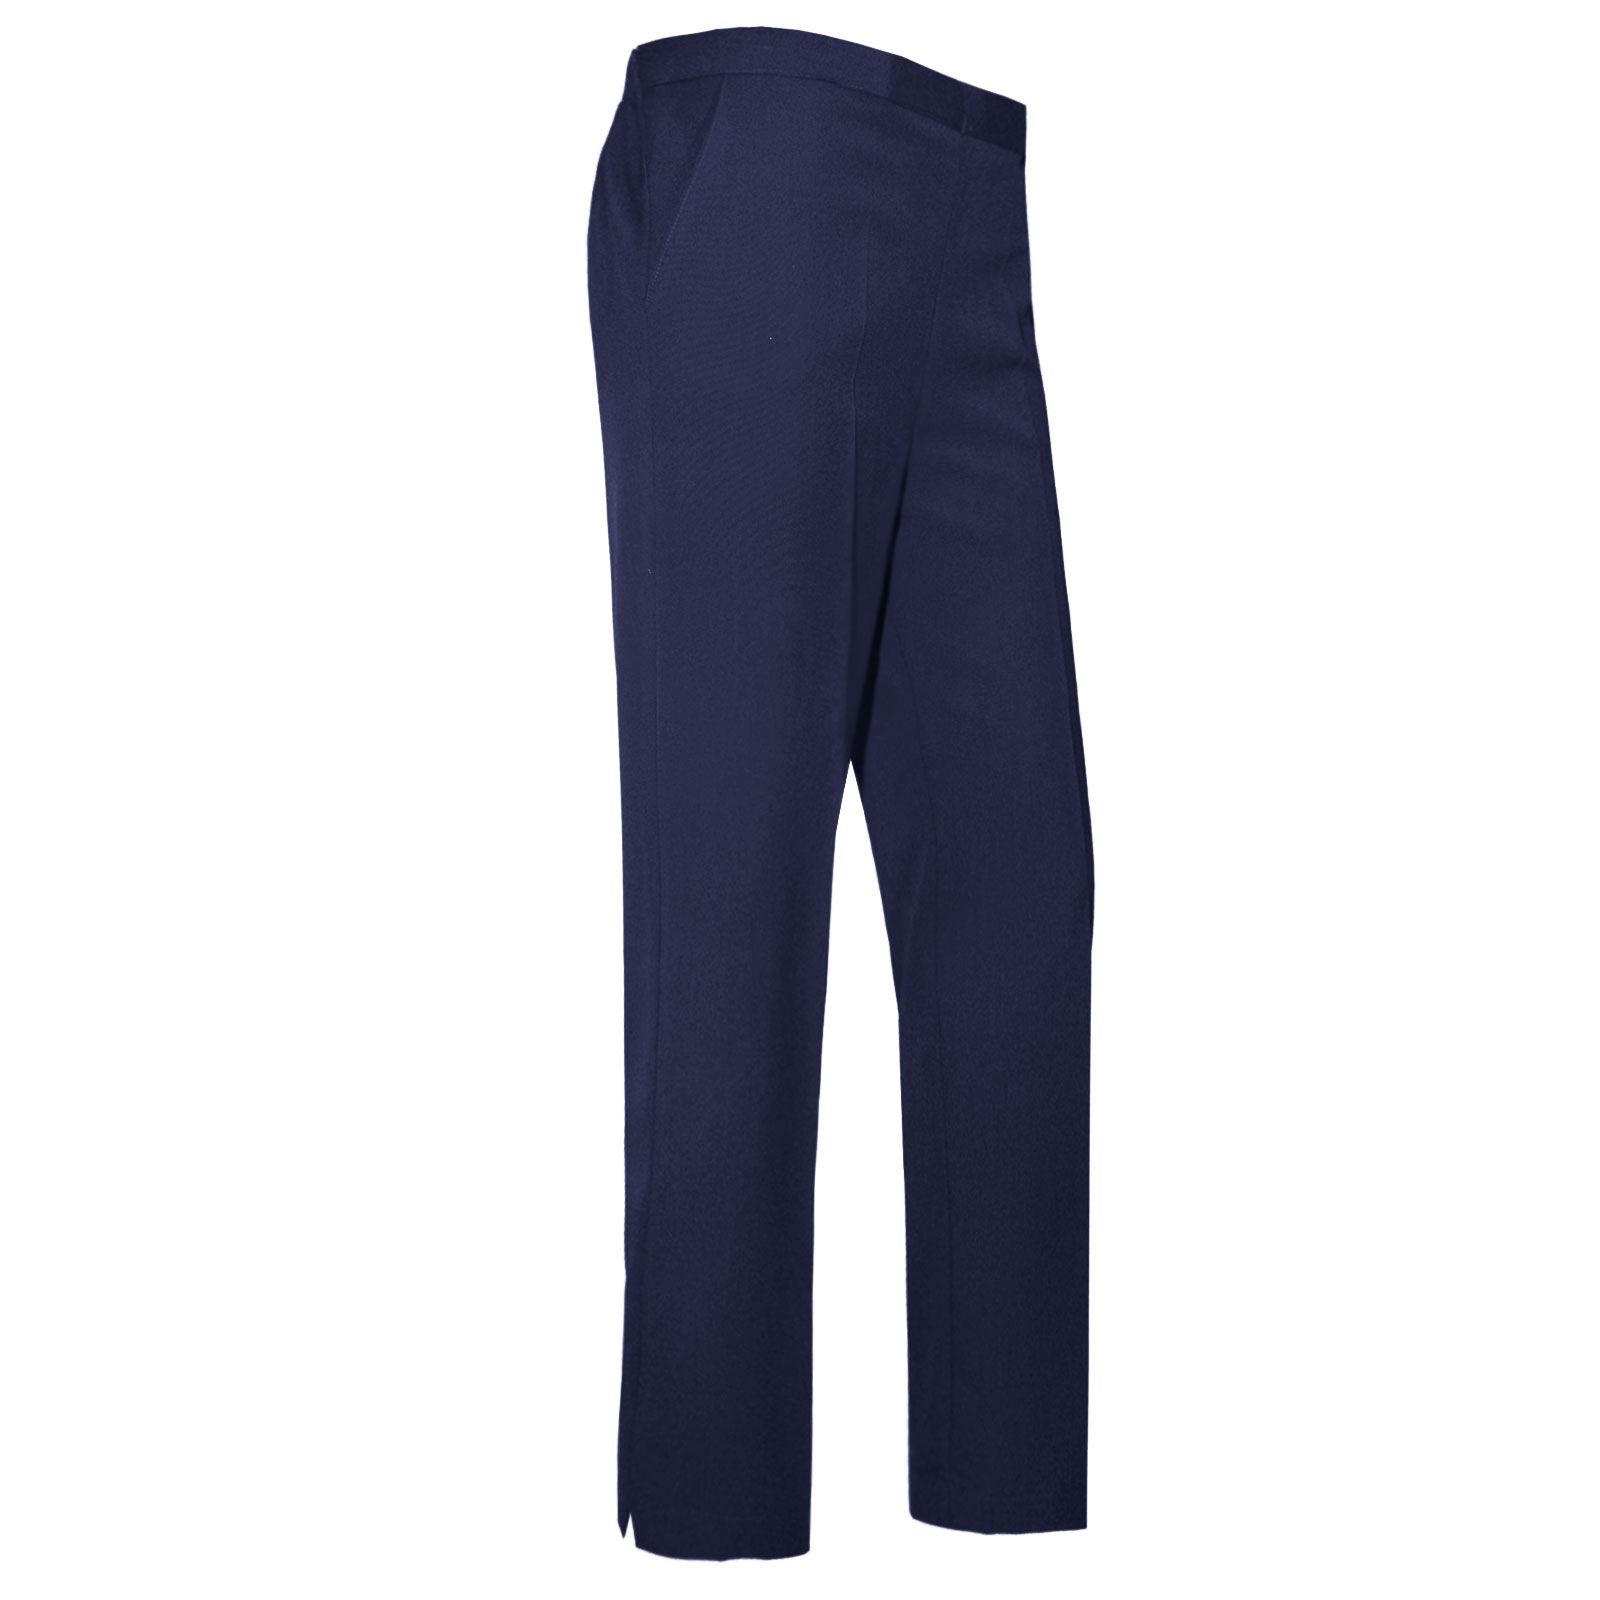 School girl pants observation 5